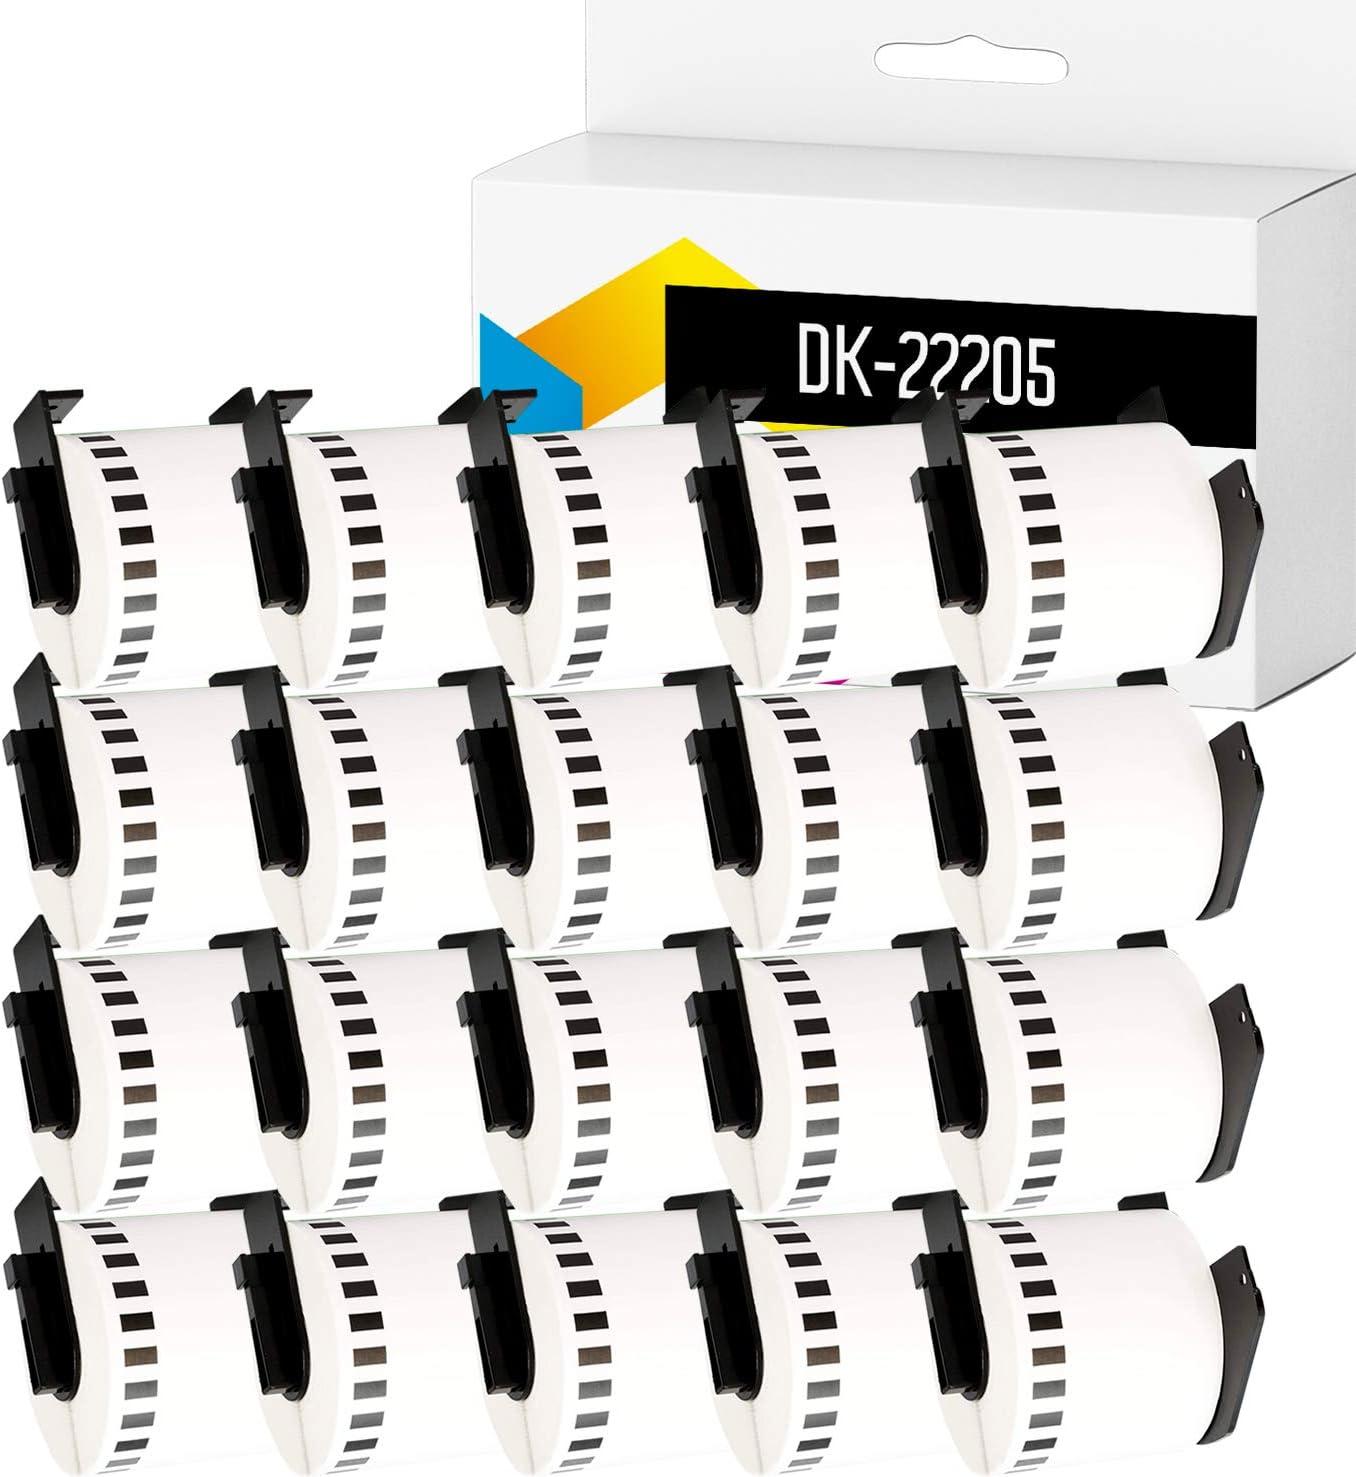 Cinta Compatible para Impresoras Brother P-Touch QL-500 QL-570 QL-700 QL-720NW QL-800 QL-810W QL-820NWB QL-1050 QL-1100 QL-1110NWB 1 62mm x 30.48m TONERPACK 1 Etiqueta Continua DK22205